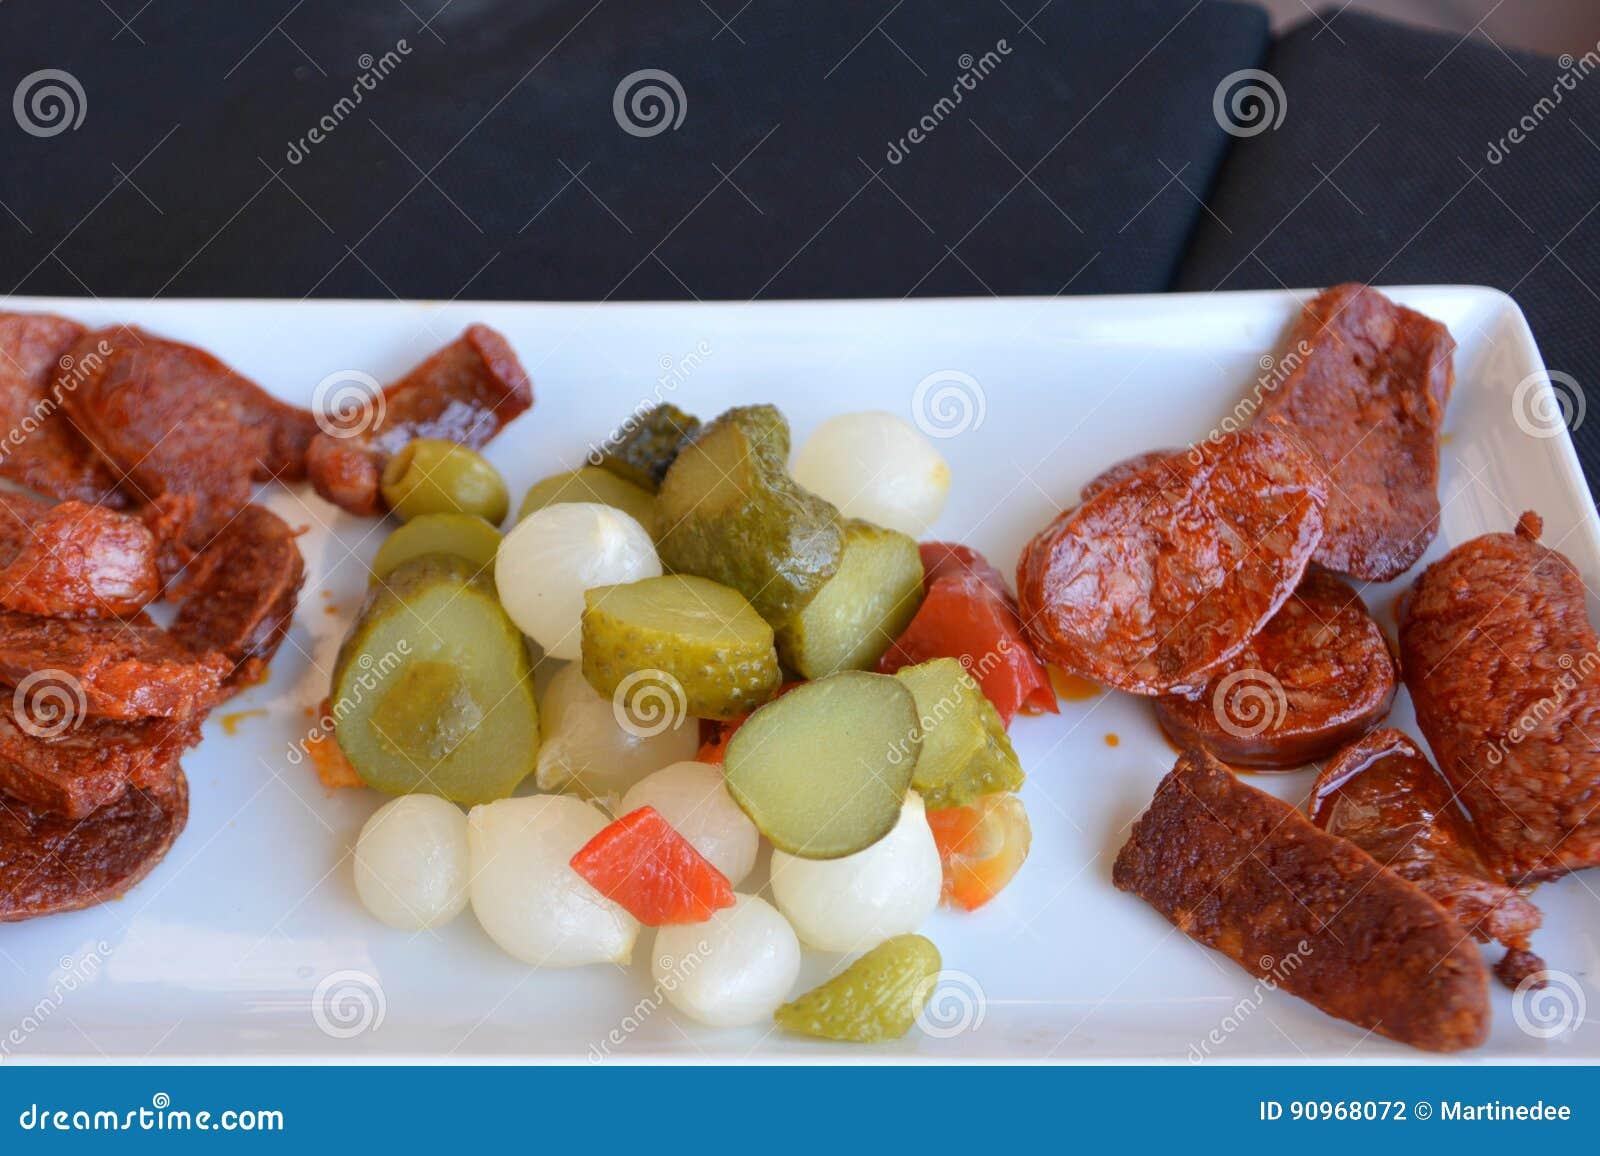 Mediterranean Cuisine  Spanish Tapas Starters On A